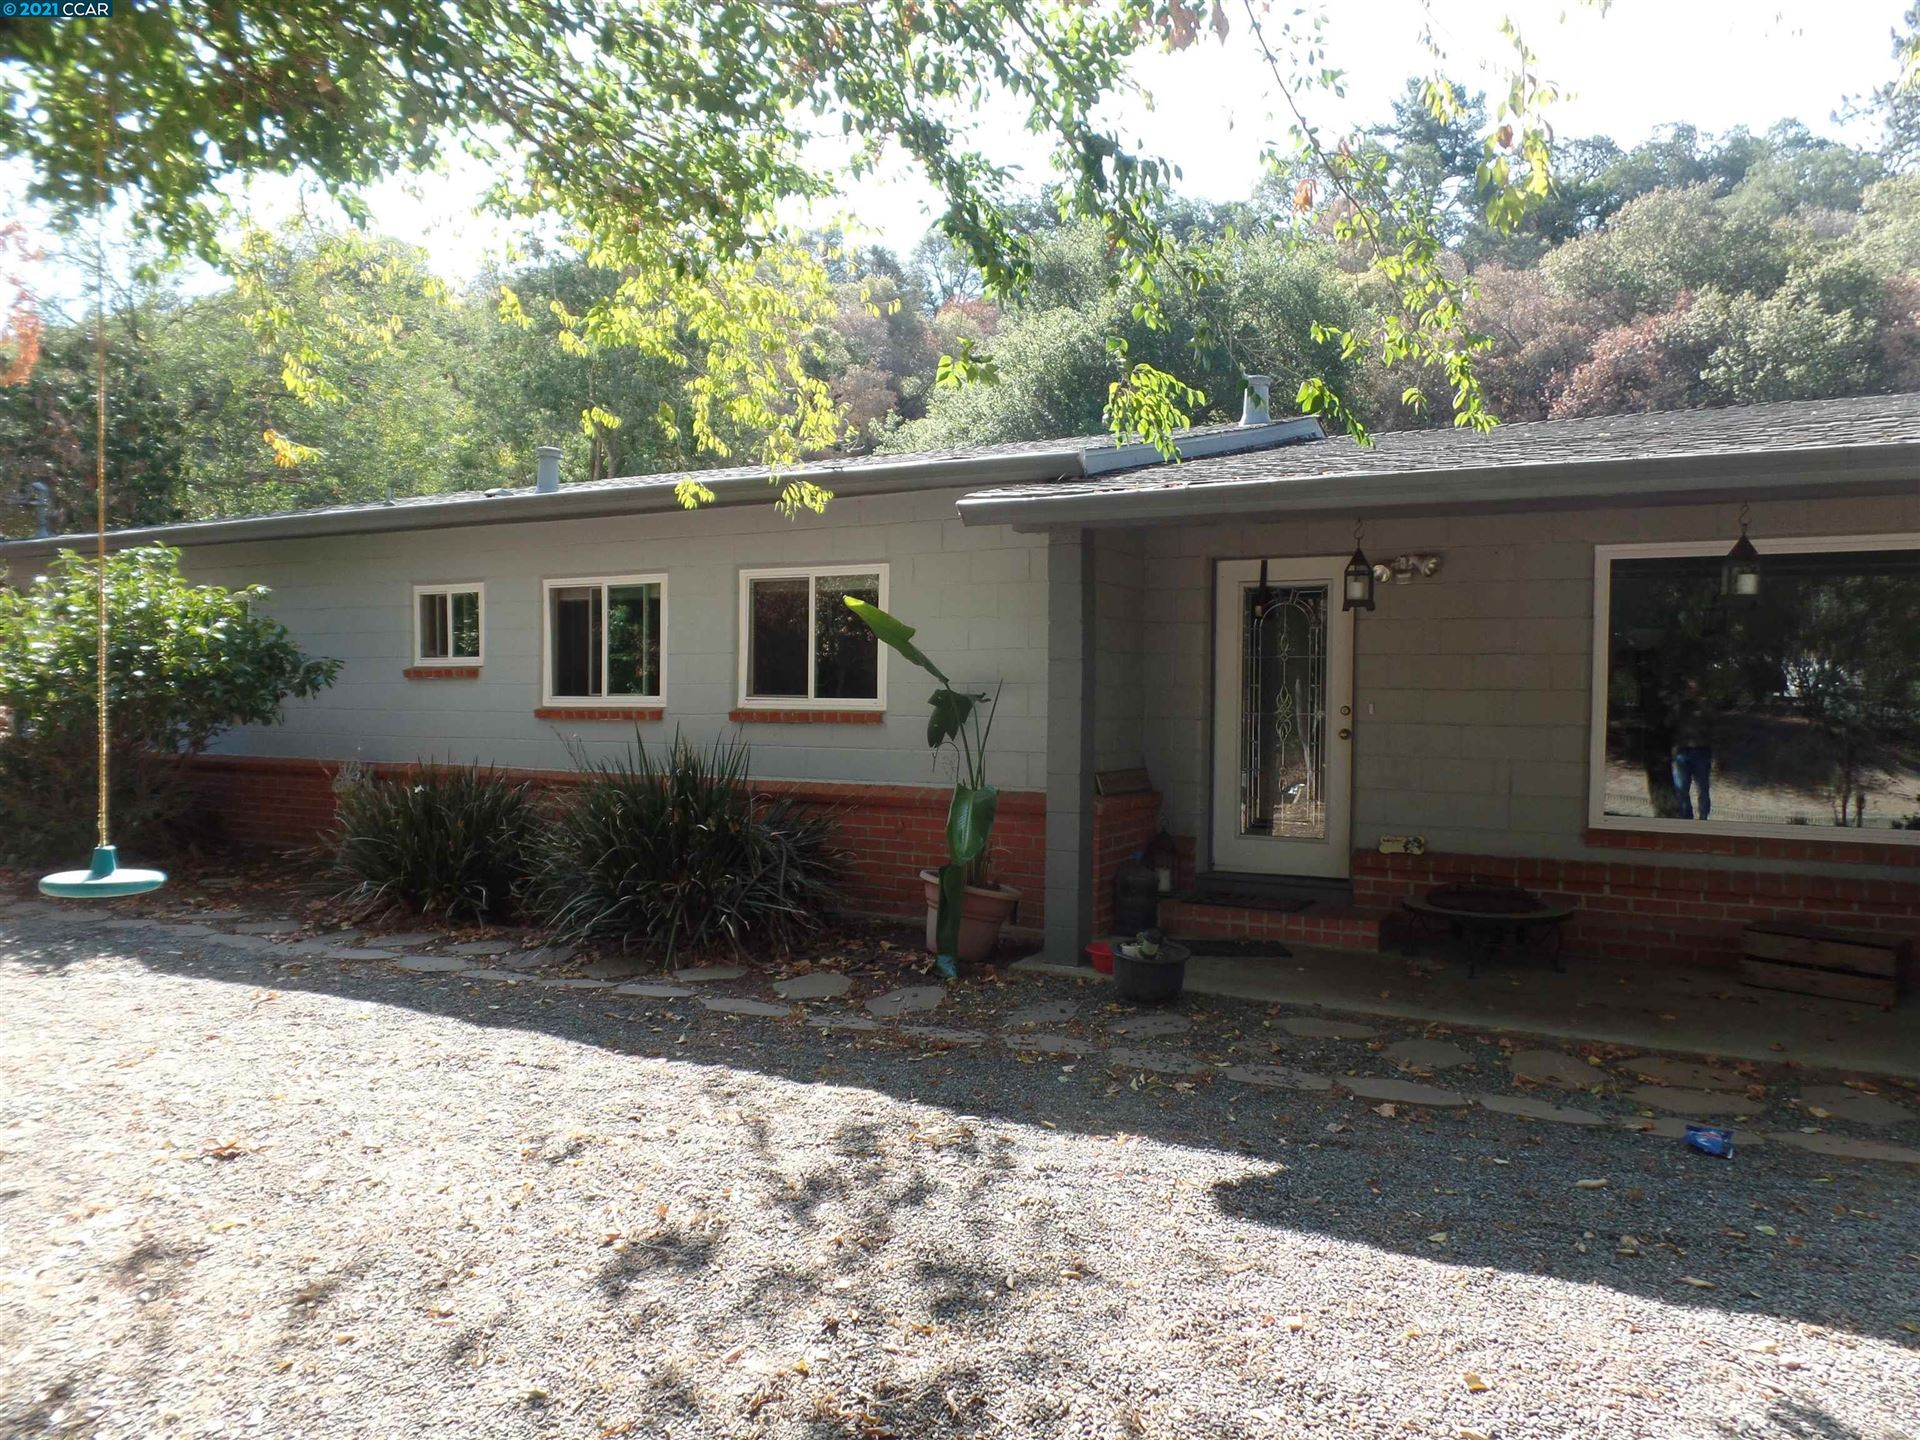 Photo of 3060 Lester Road, MARTINEZ, CA 94553-4552 (MLS # 40968645)